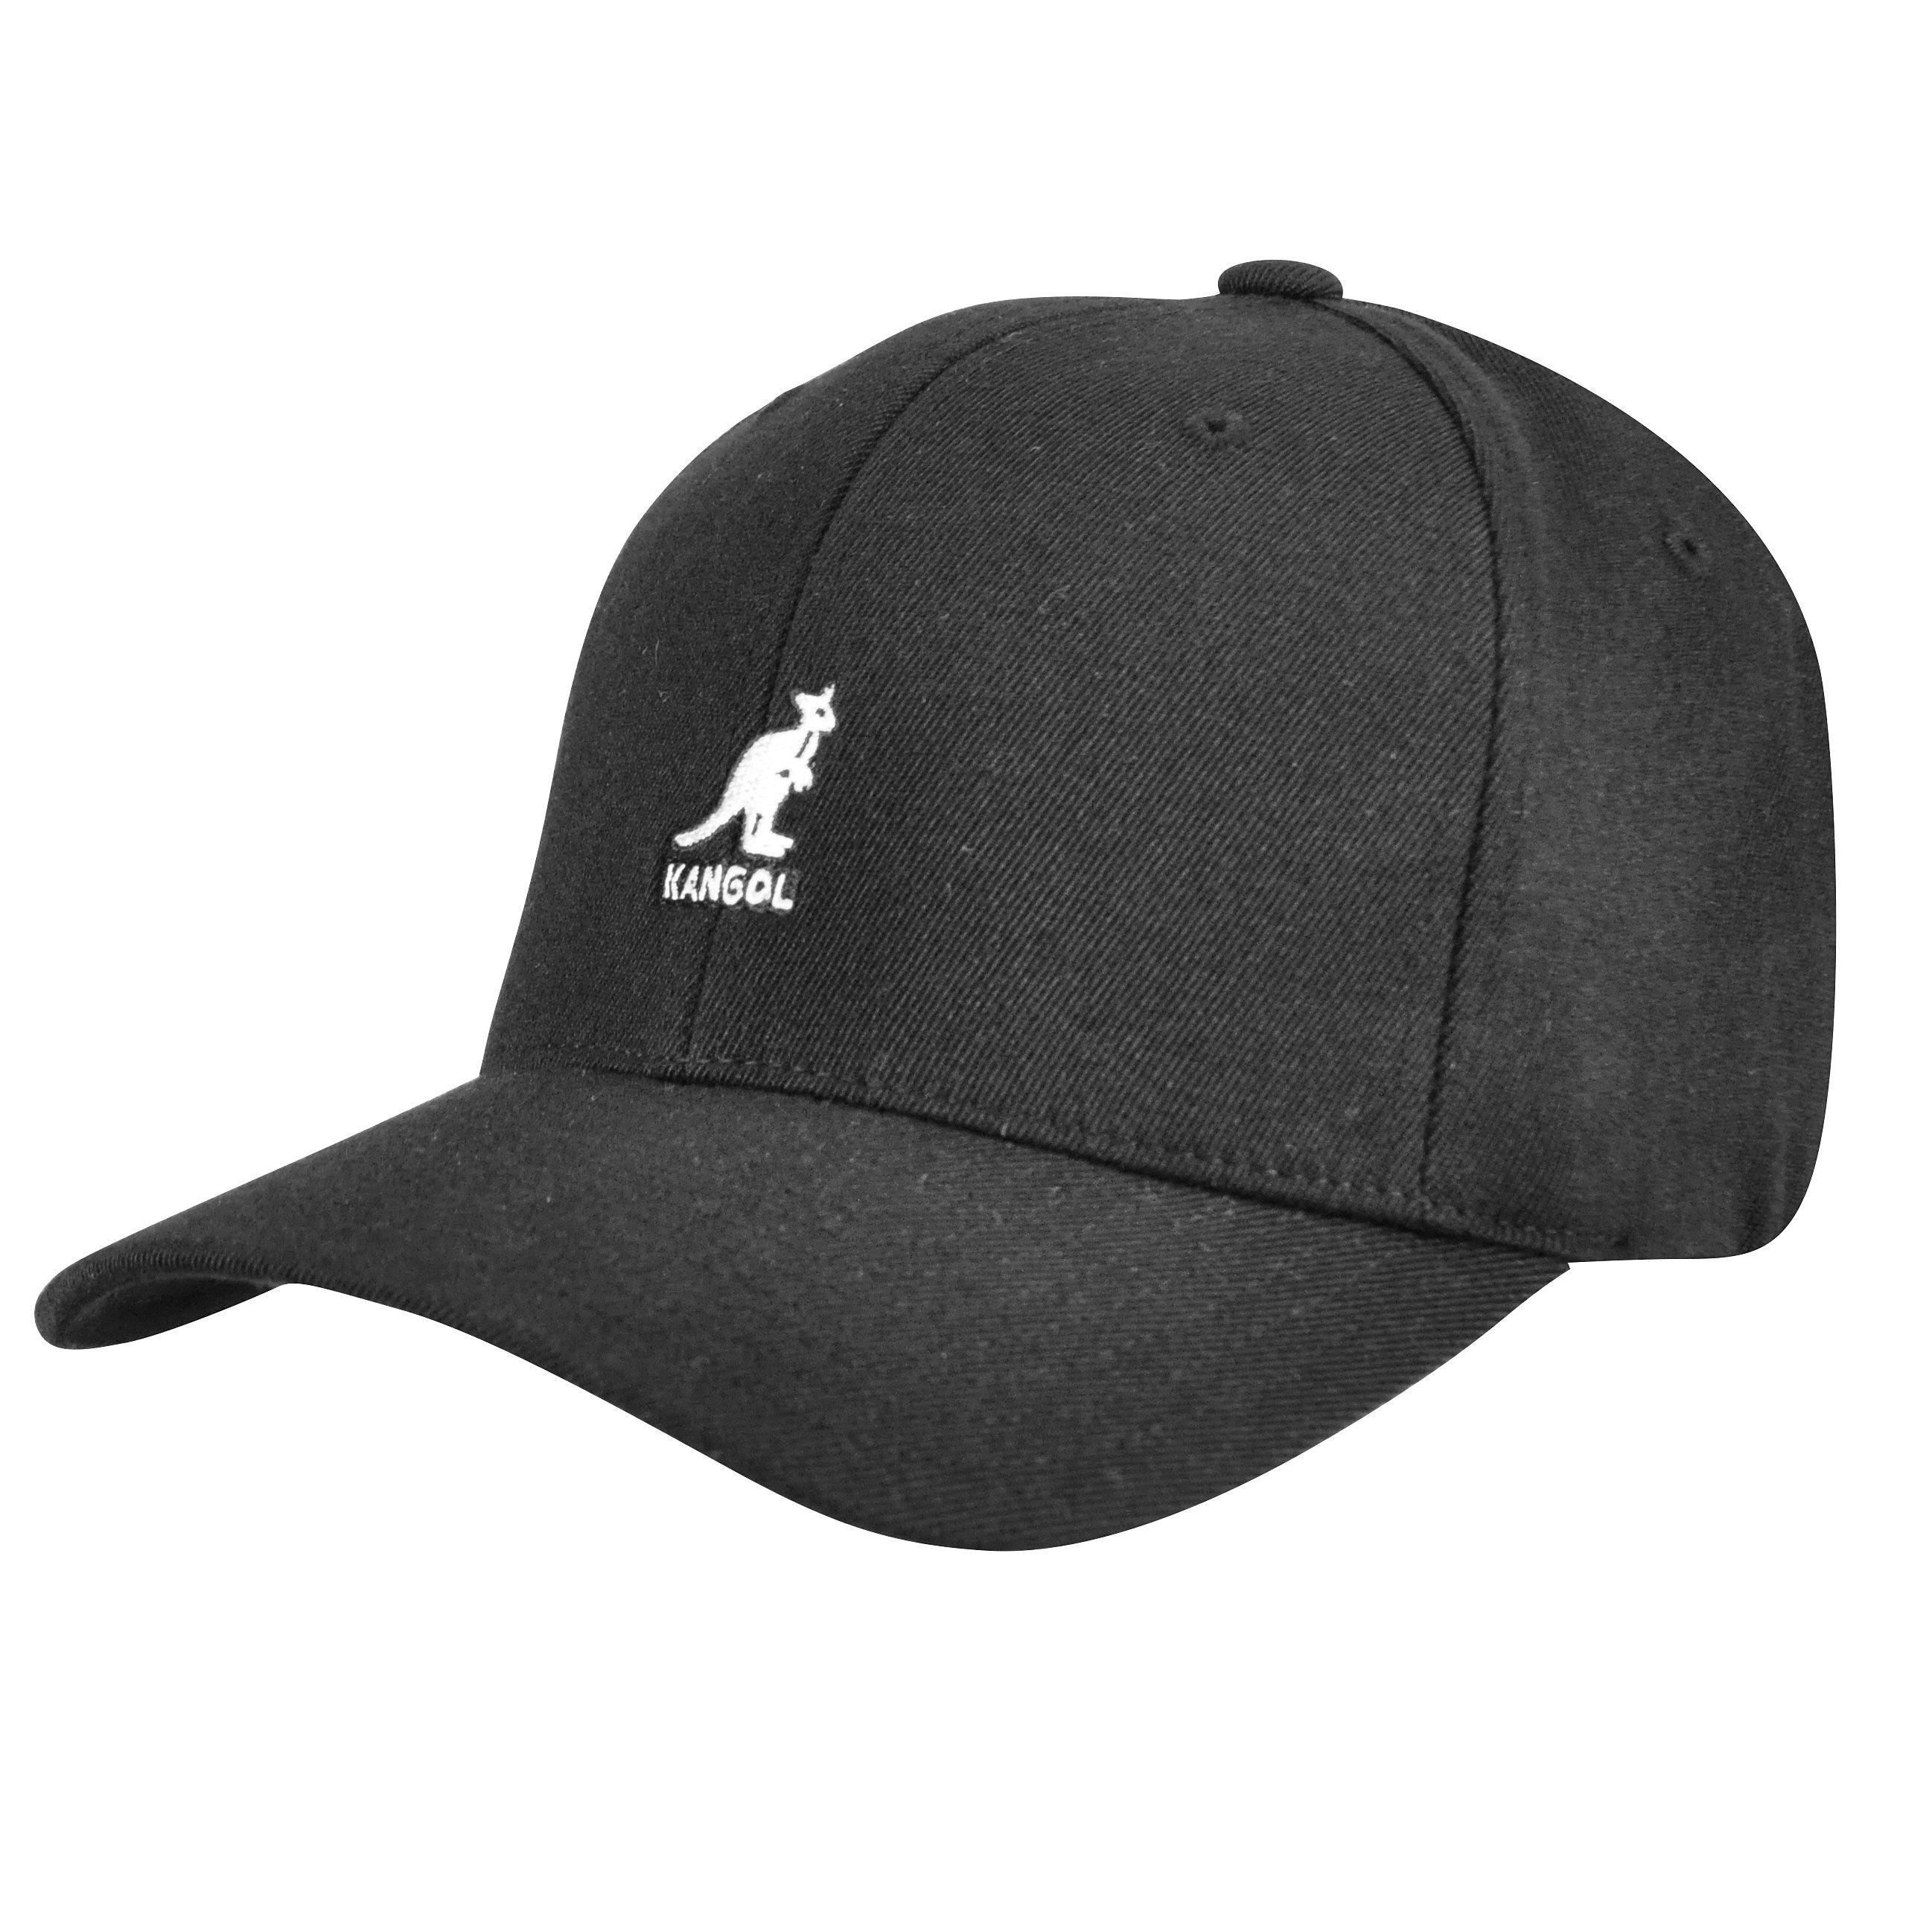 b17e8c34 Kangol Wool Flexfit Baseball Black Cap | Da'Cave Store Singapore